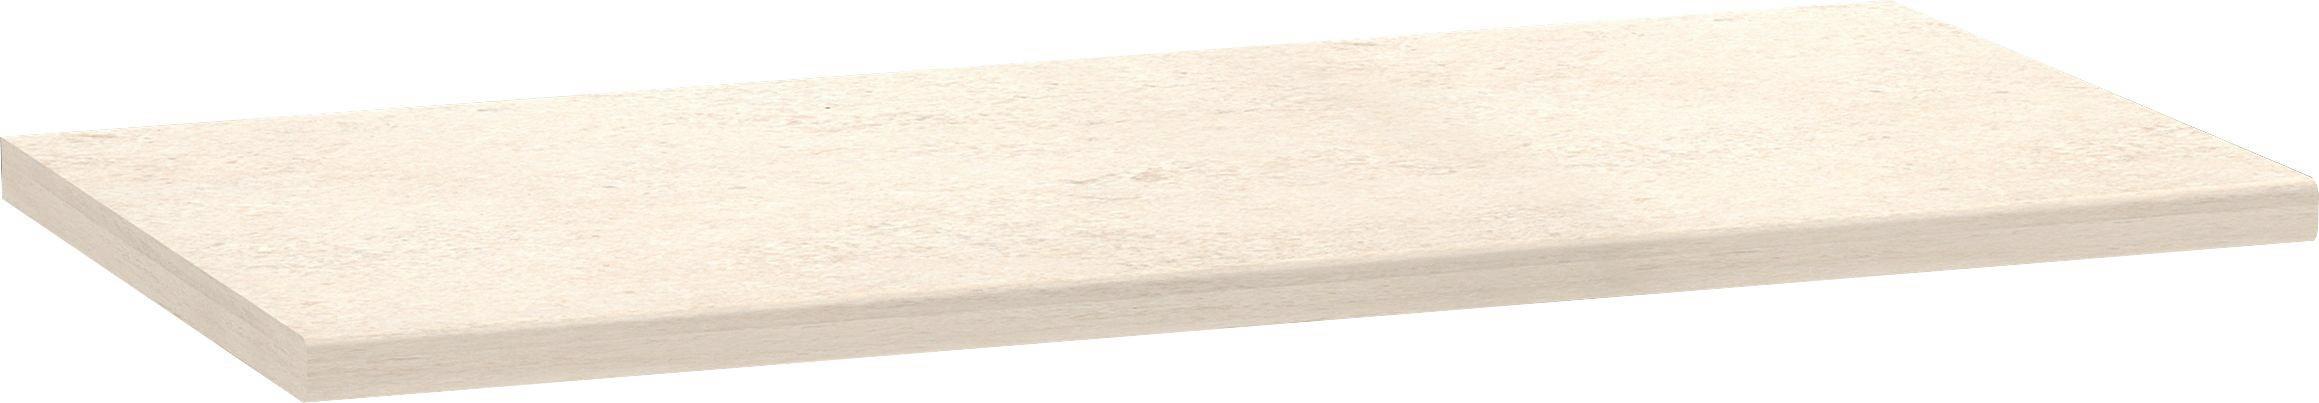 Munkalap Multiforte - fehér, modern, fa (123/3,9/60cm)